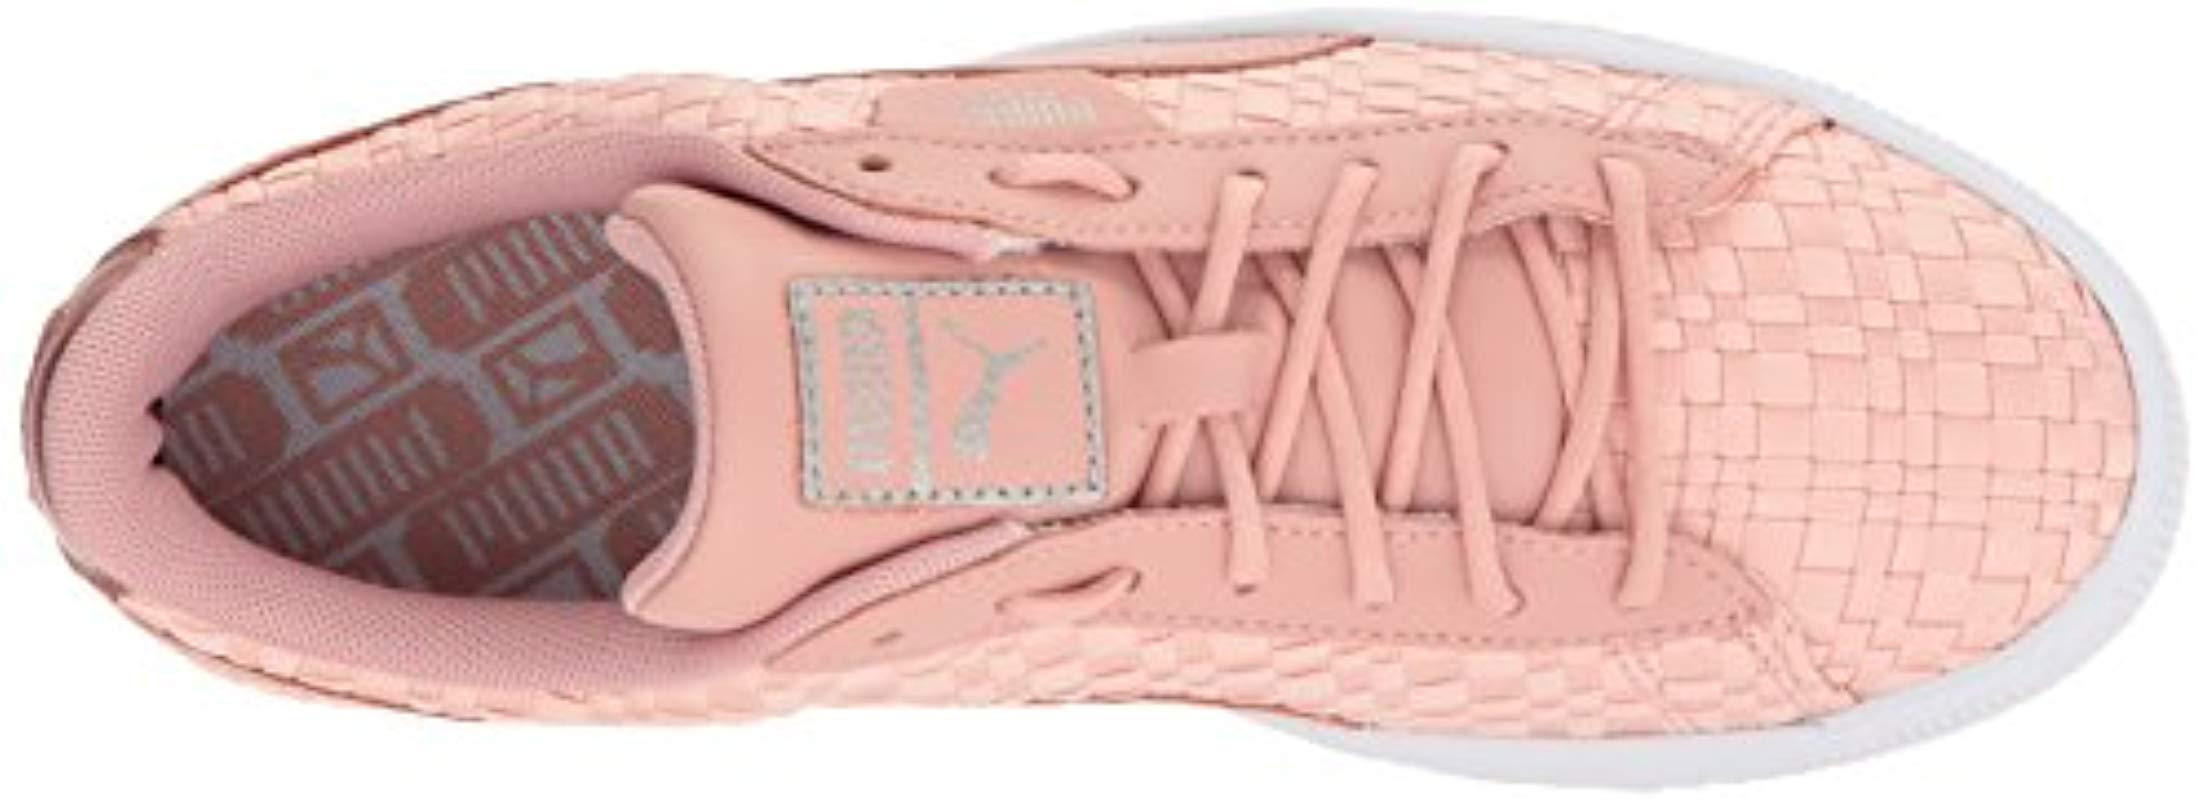 fd749bb95ae PUMA - Pink Basket Satin En Pointe Wn Sneaker - Lyst. View fullscreen